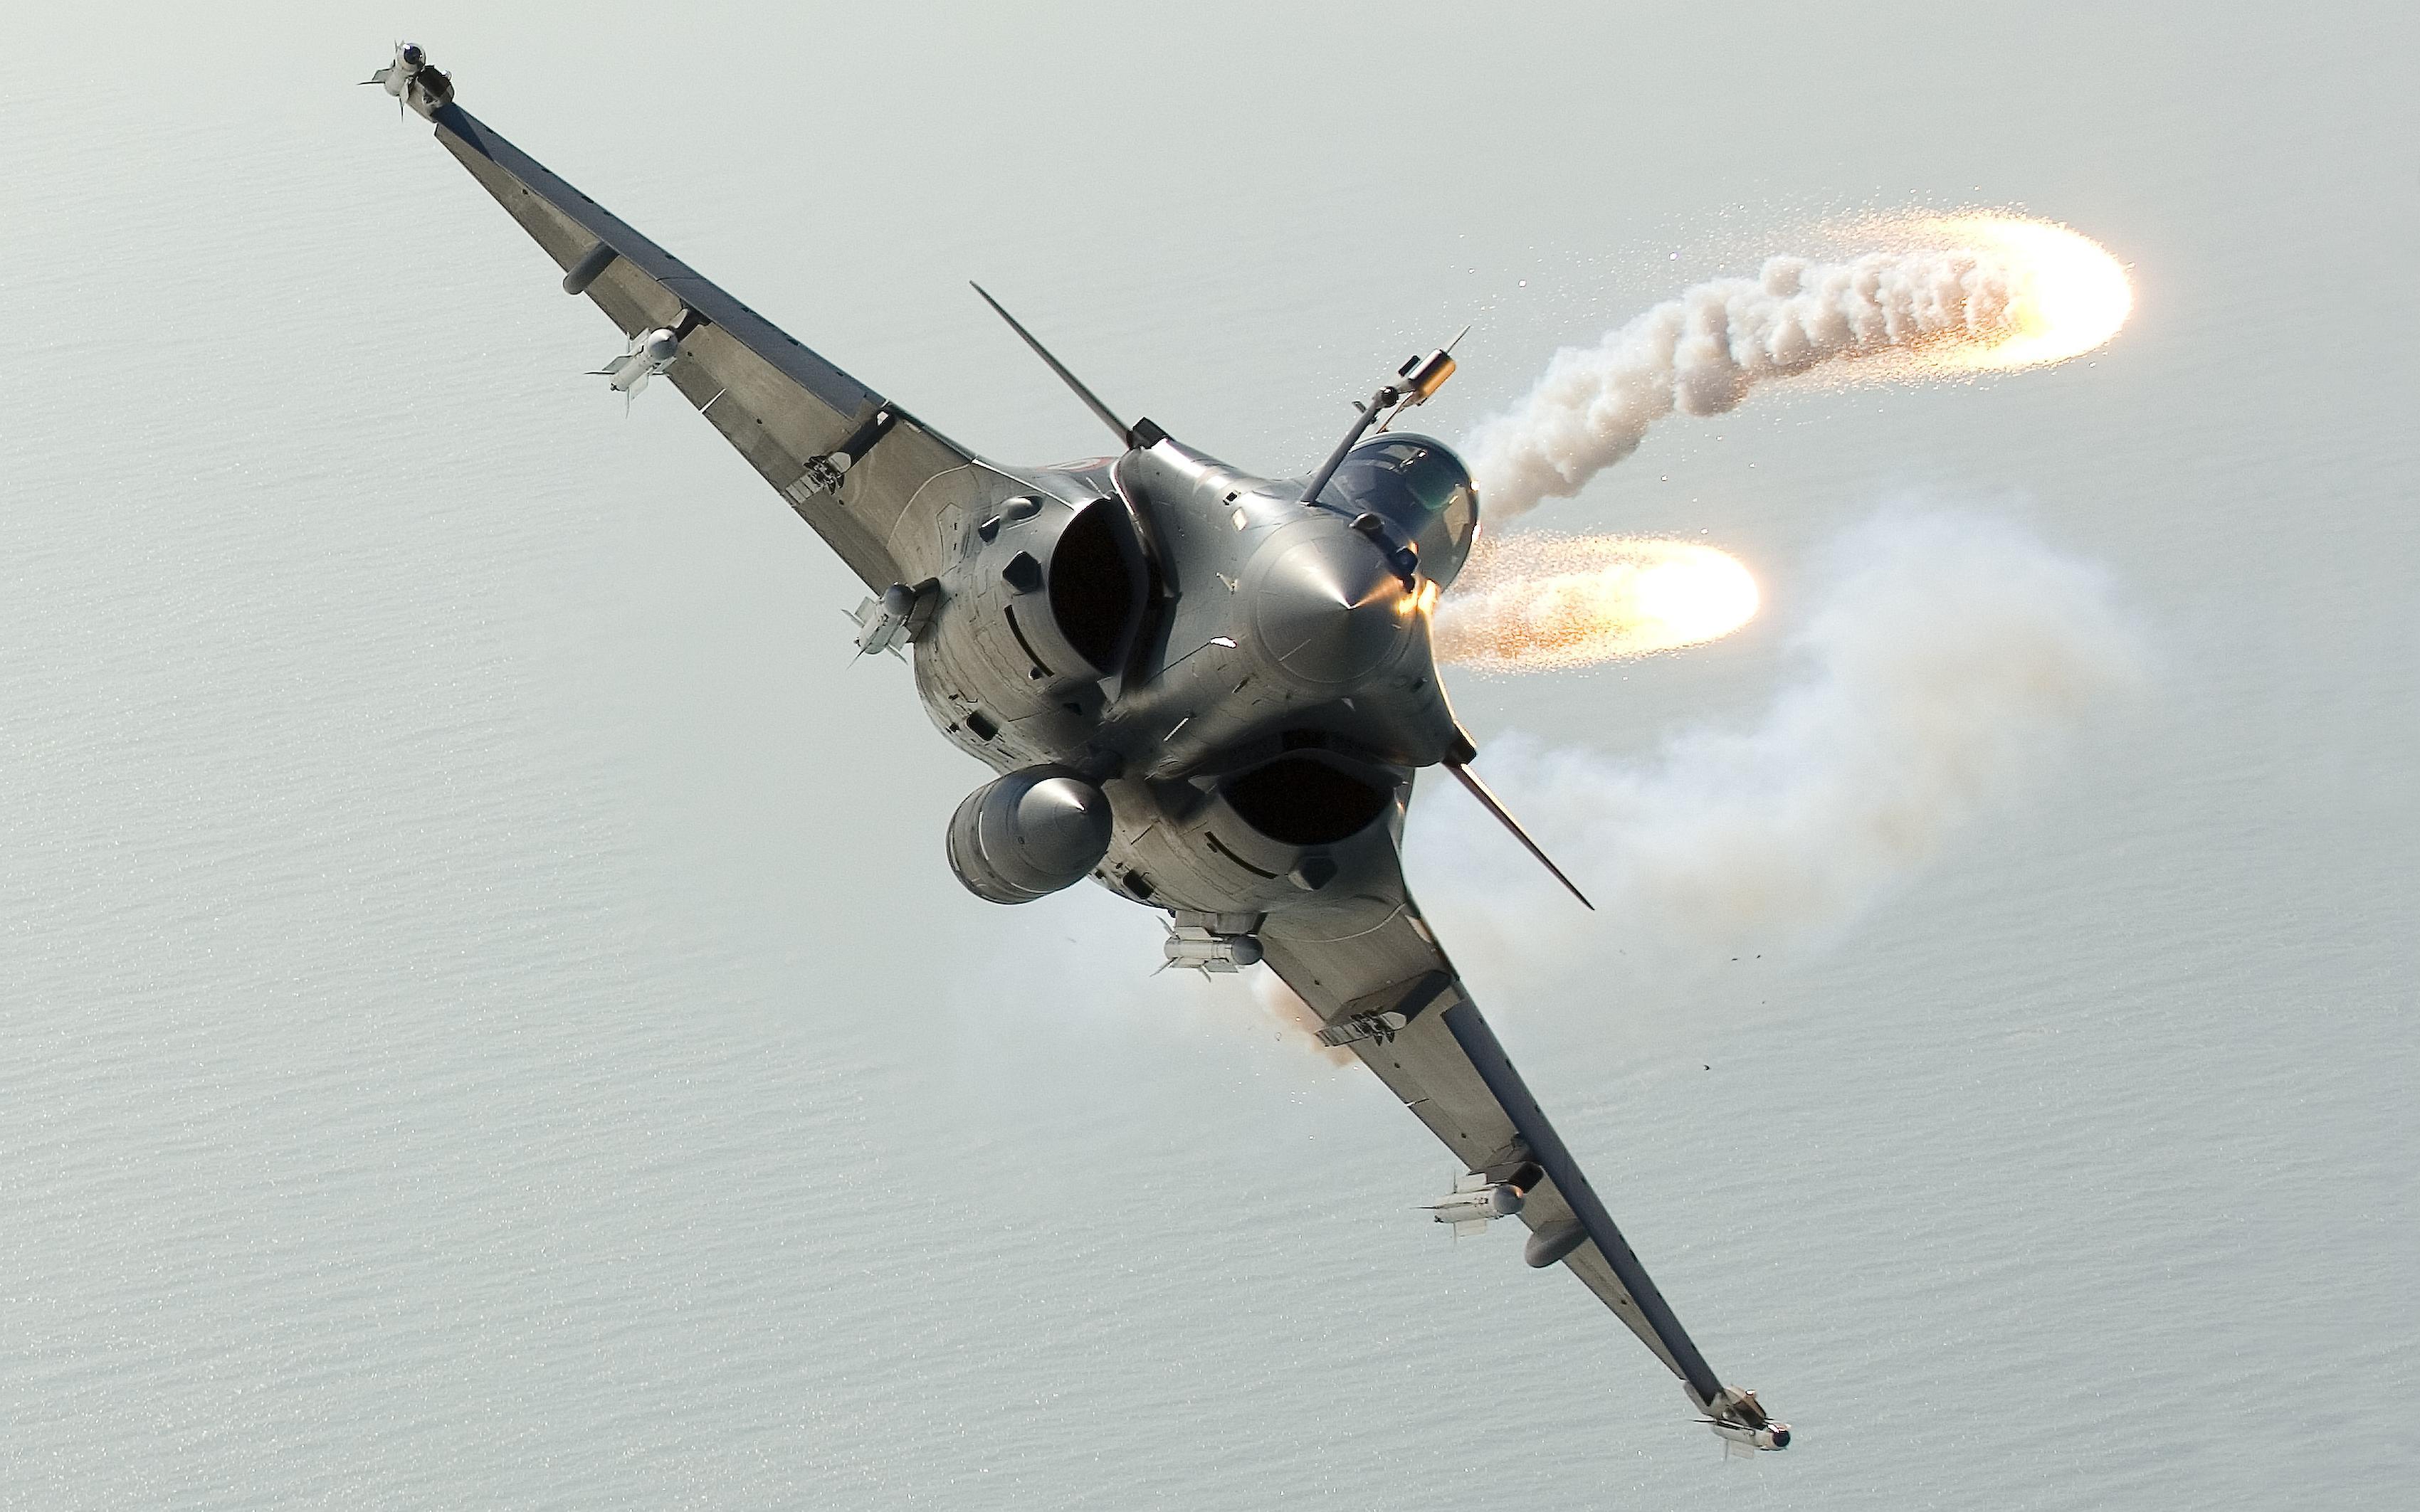 Dassault Rafale Wallpaper HD Download